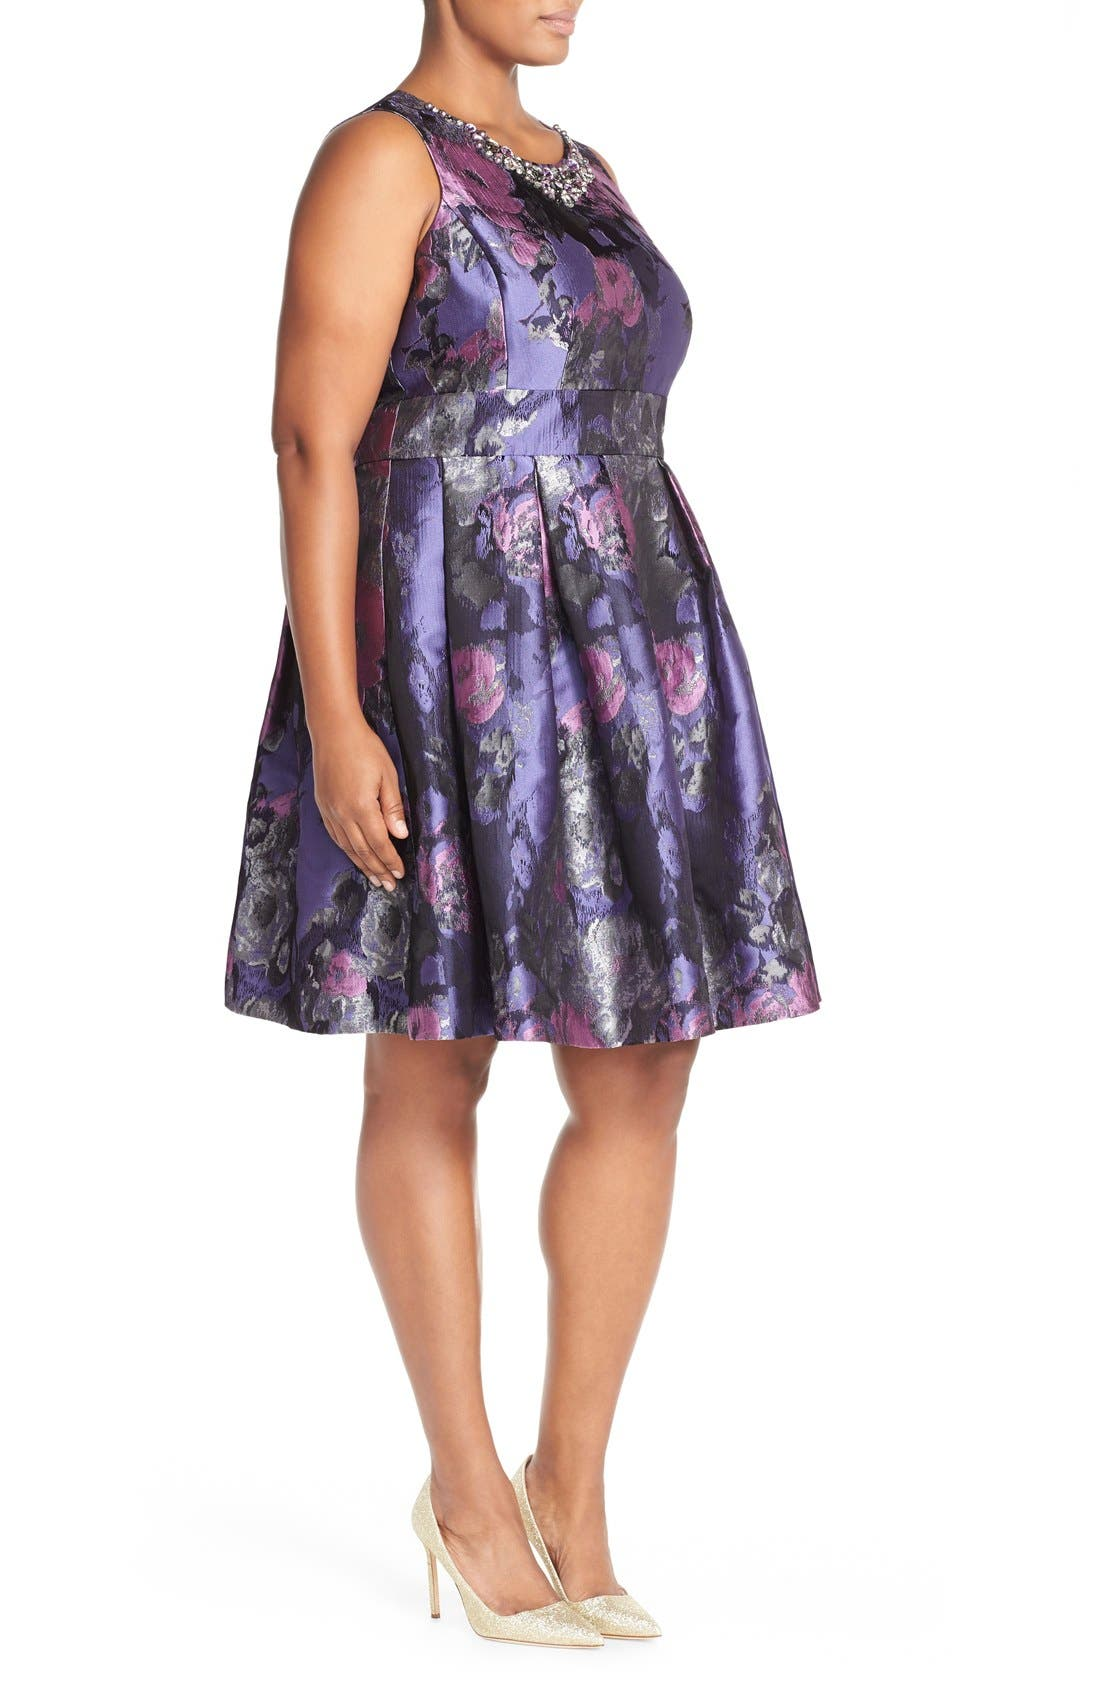 ELIZA J, Embellished Neck Metallic Jacquard Fit & Flare Dress, Alternate thumbnail 4, color, 523